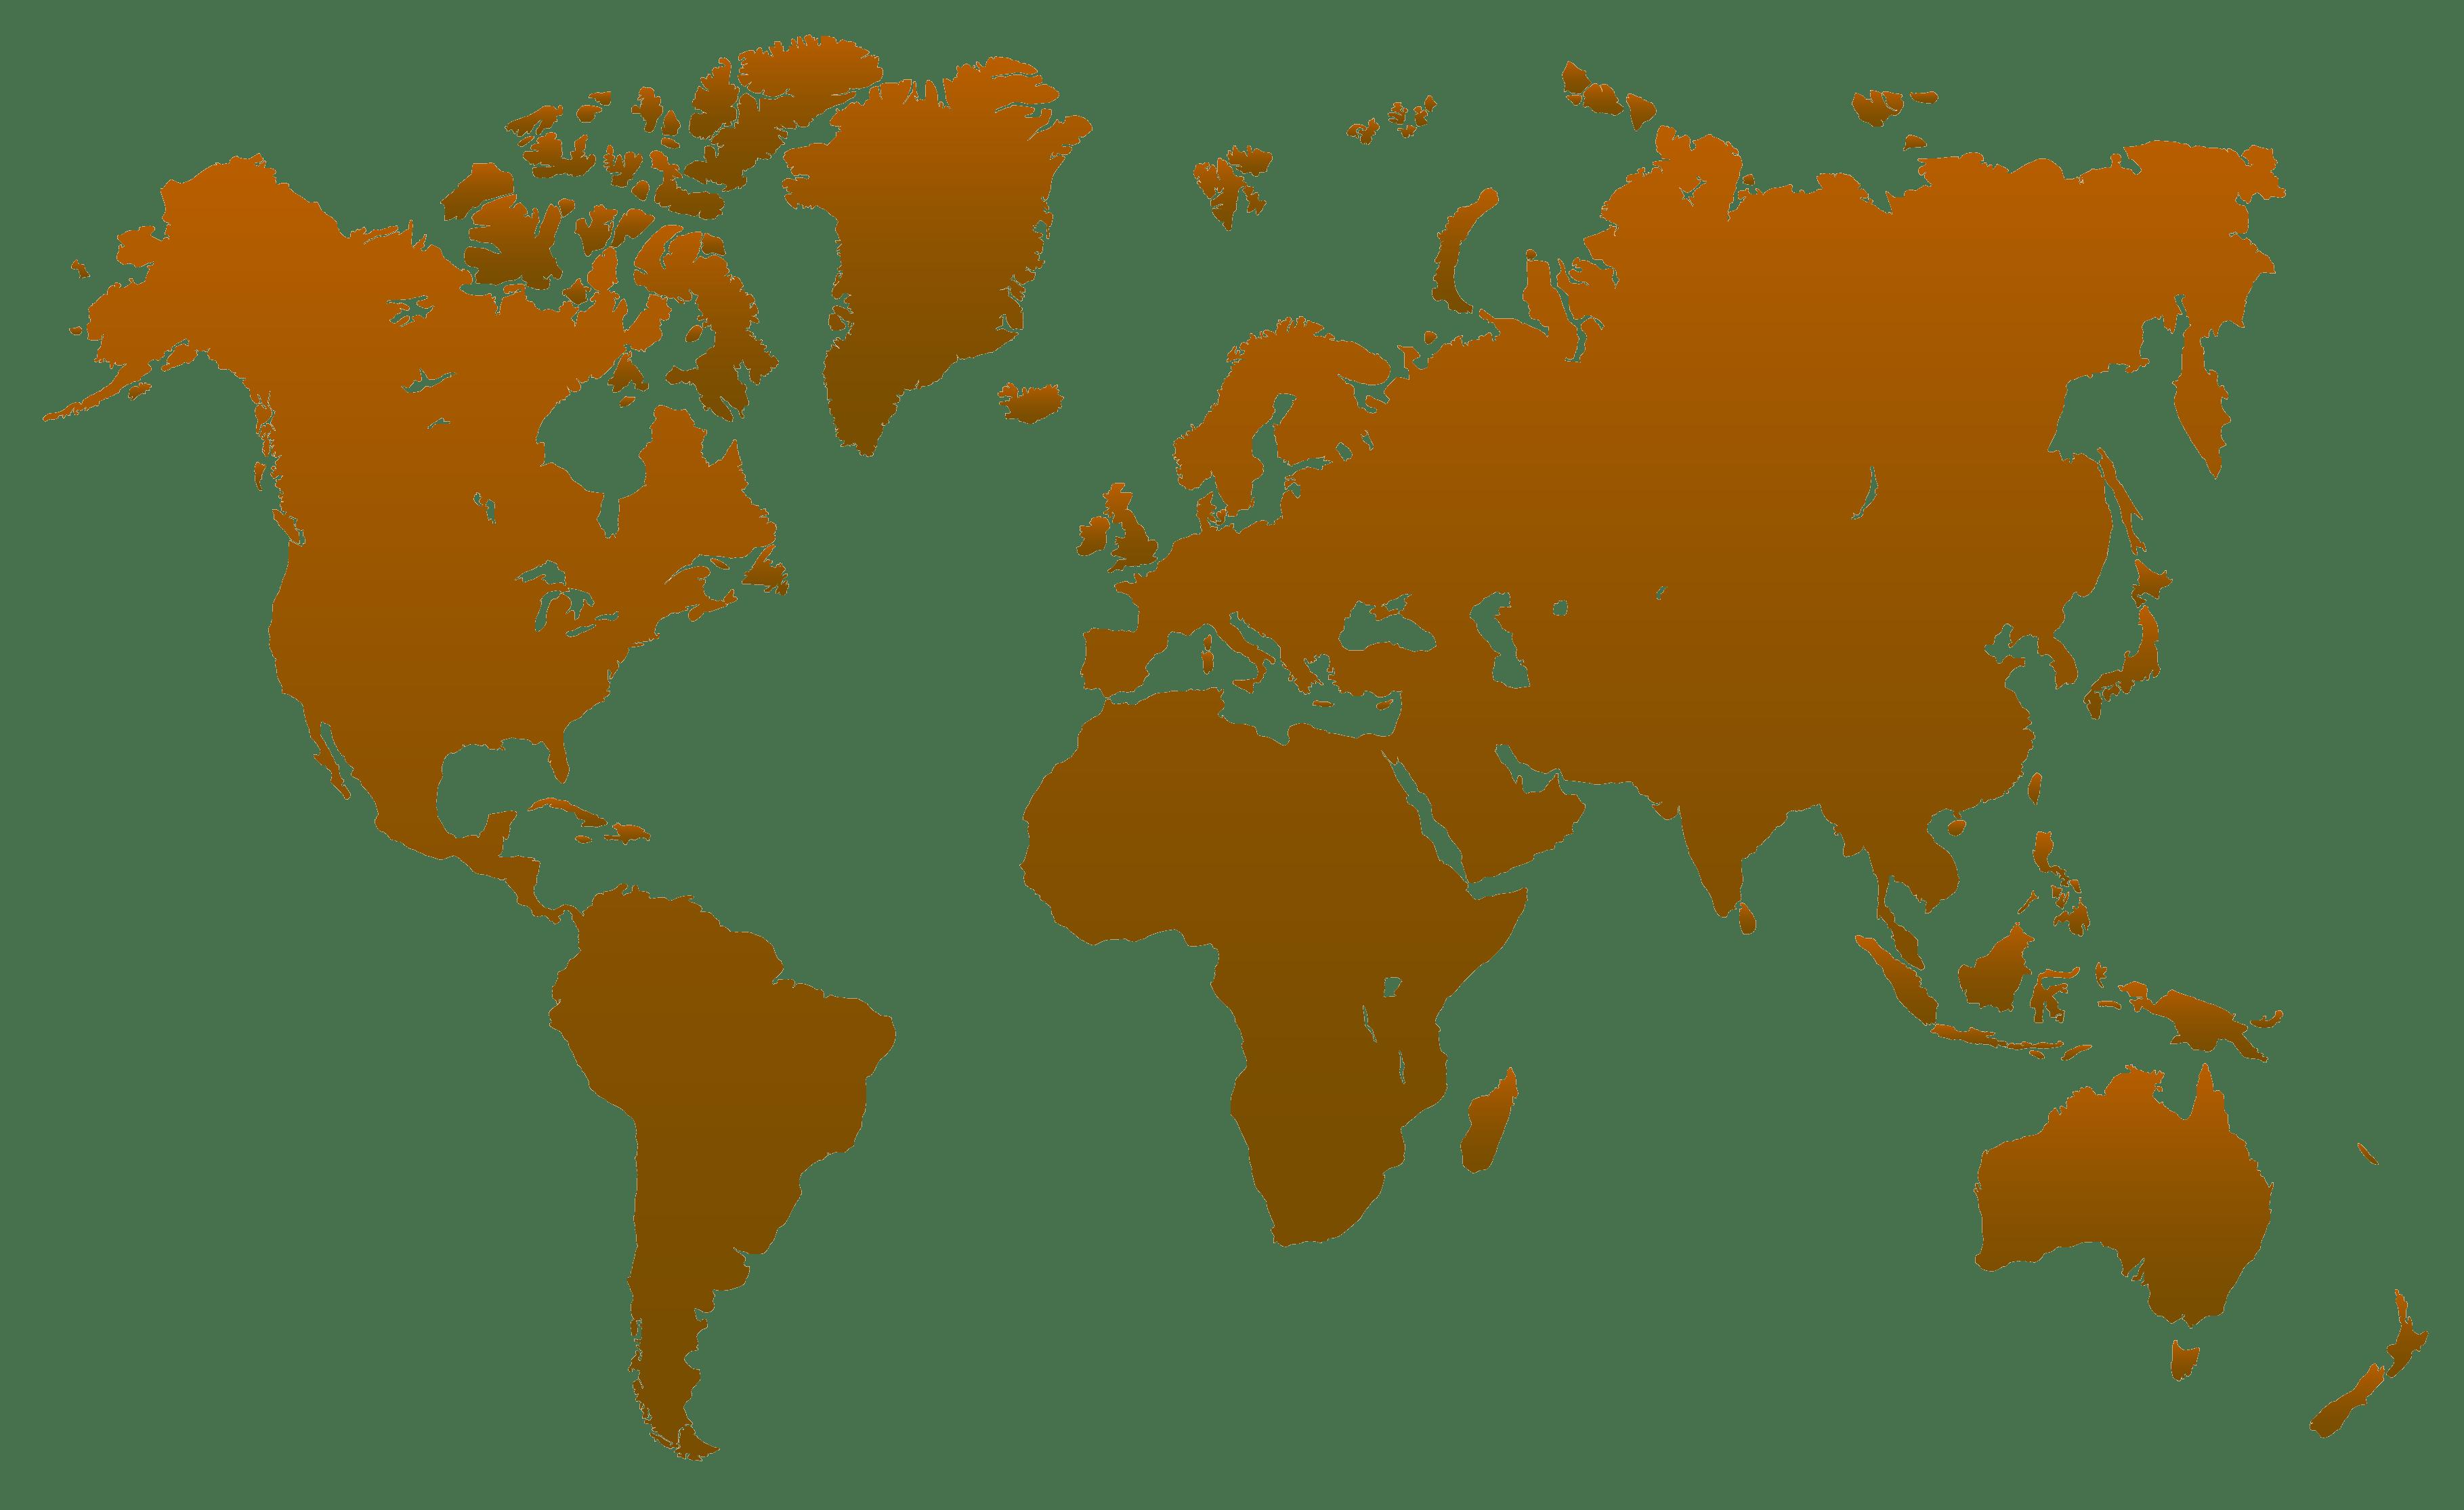 Sagrada familia silhouette png. Europe clipart transparent